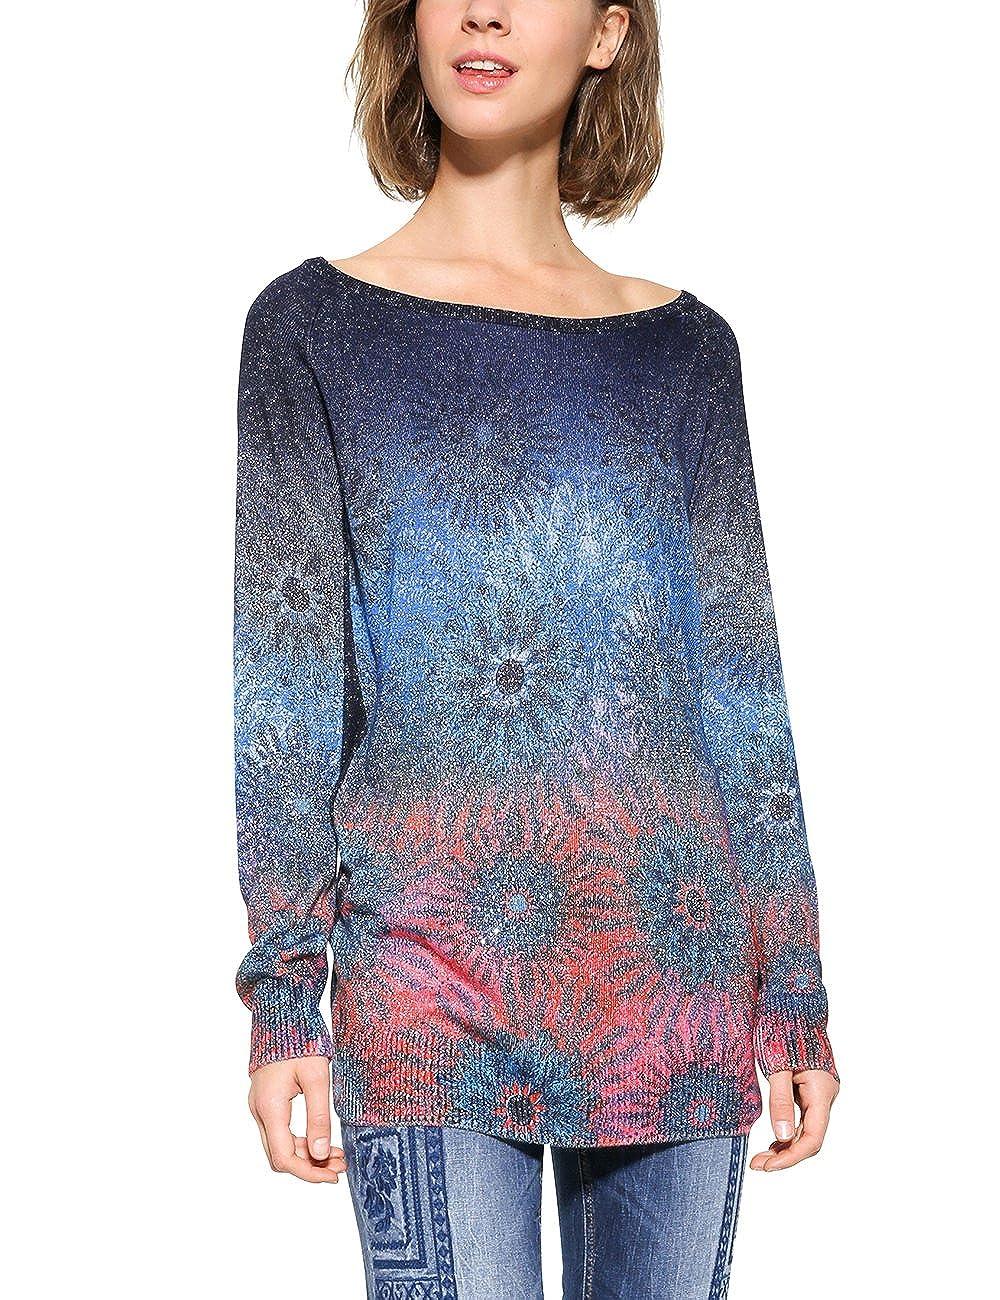 Desigual Womens Basic Carlin Woman Flat Knitted Thin Gauge Pullover